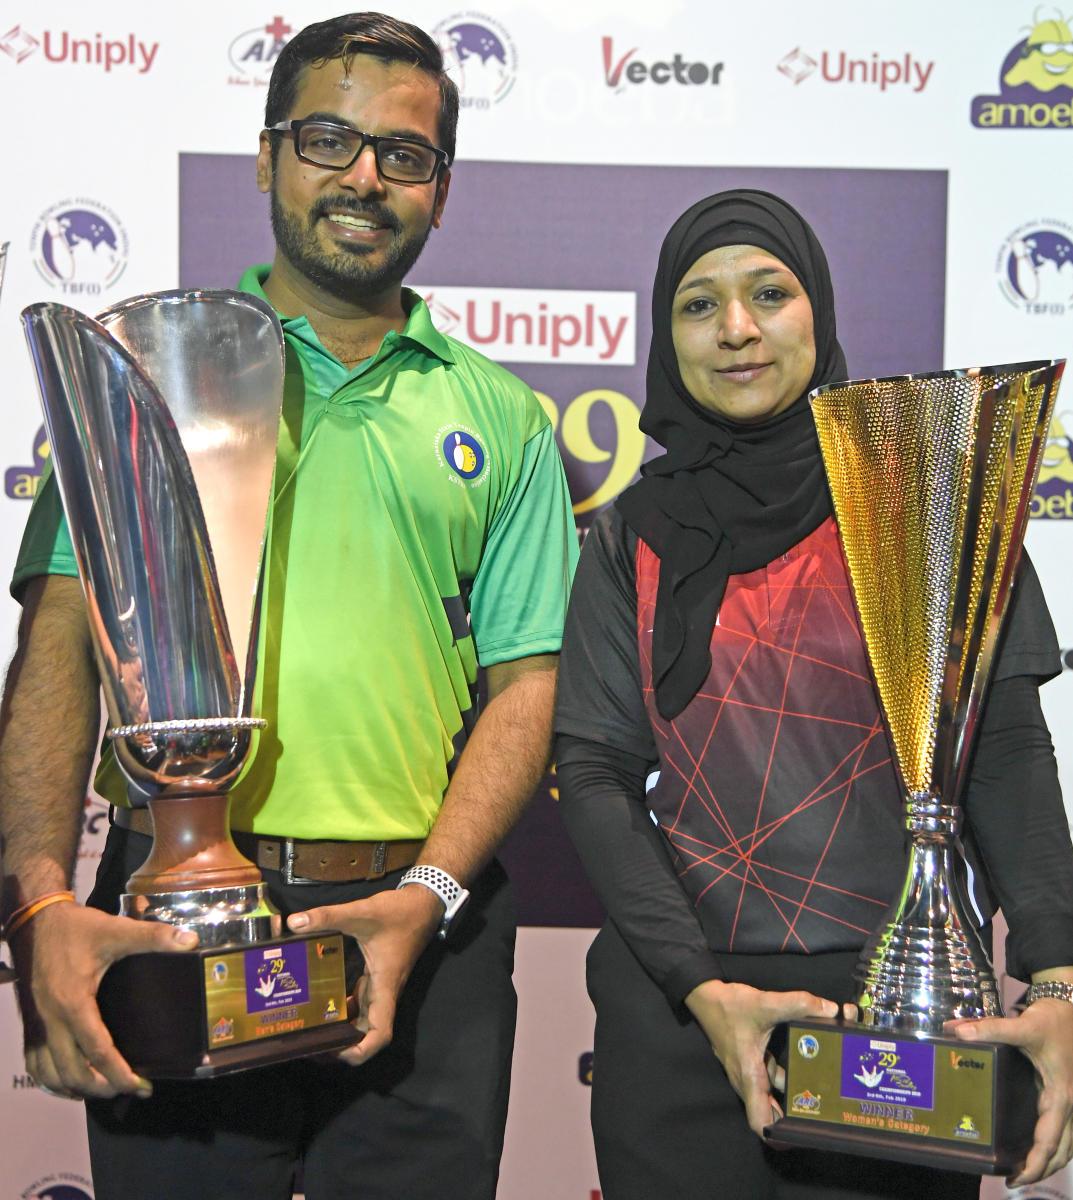 Karnataka's Akaash Ashok Kumar (left) and Sabeena Athica of Tamil Nadu with their trophies in Bengaluru on Saturday. DH PHOTO